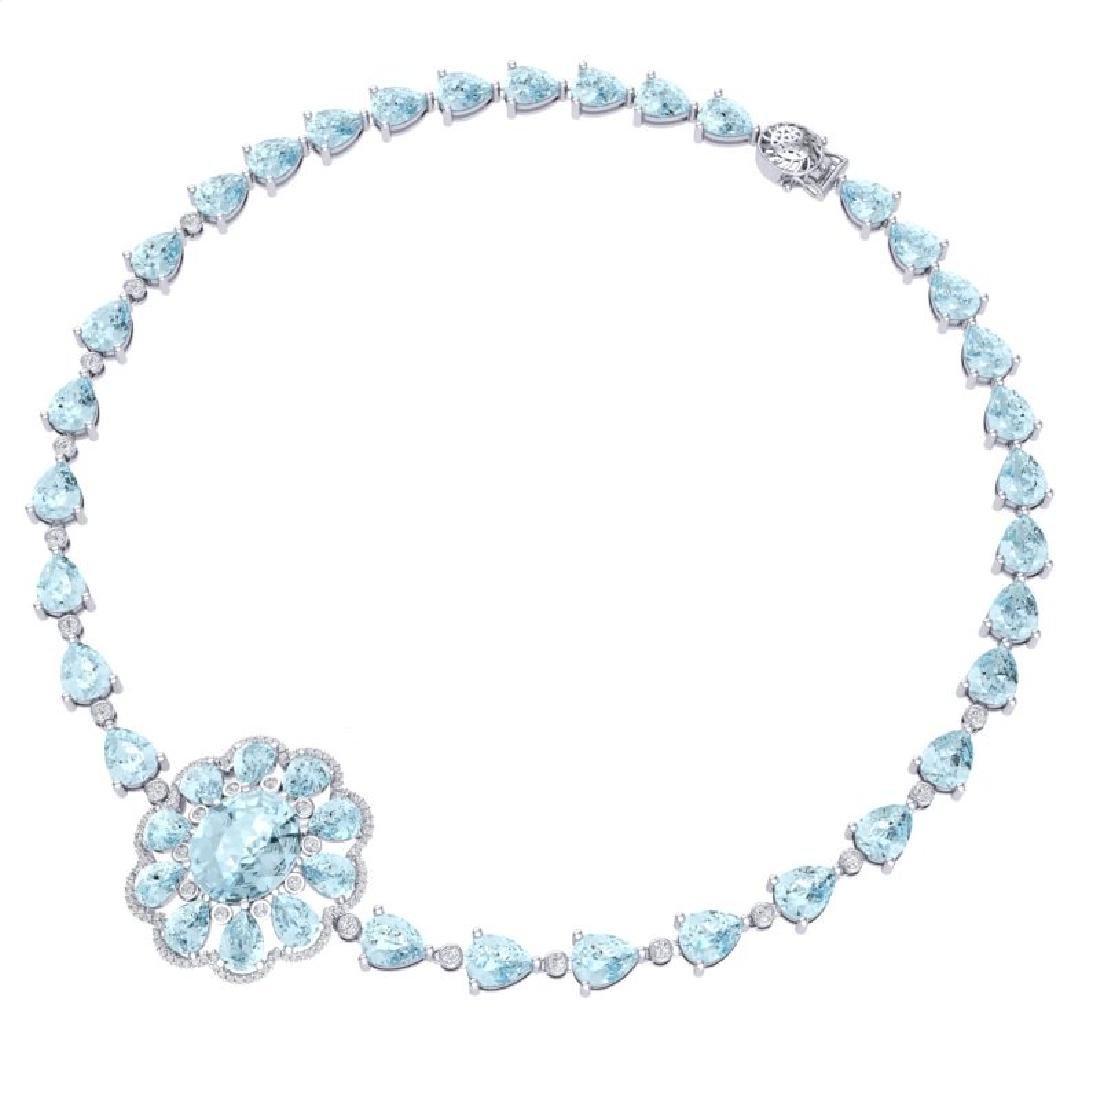 75.99 CTW Royalty Sky Topaz & VS Diamond Necklace 18K - 3